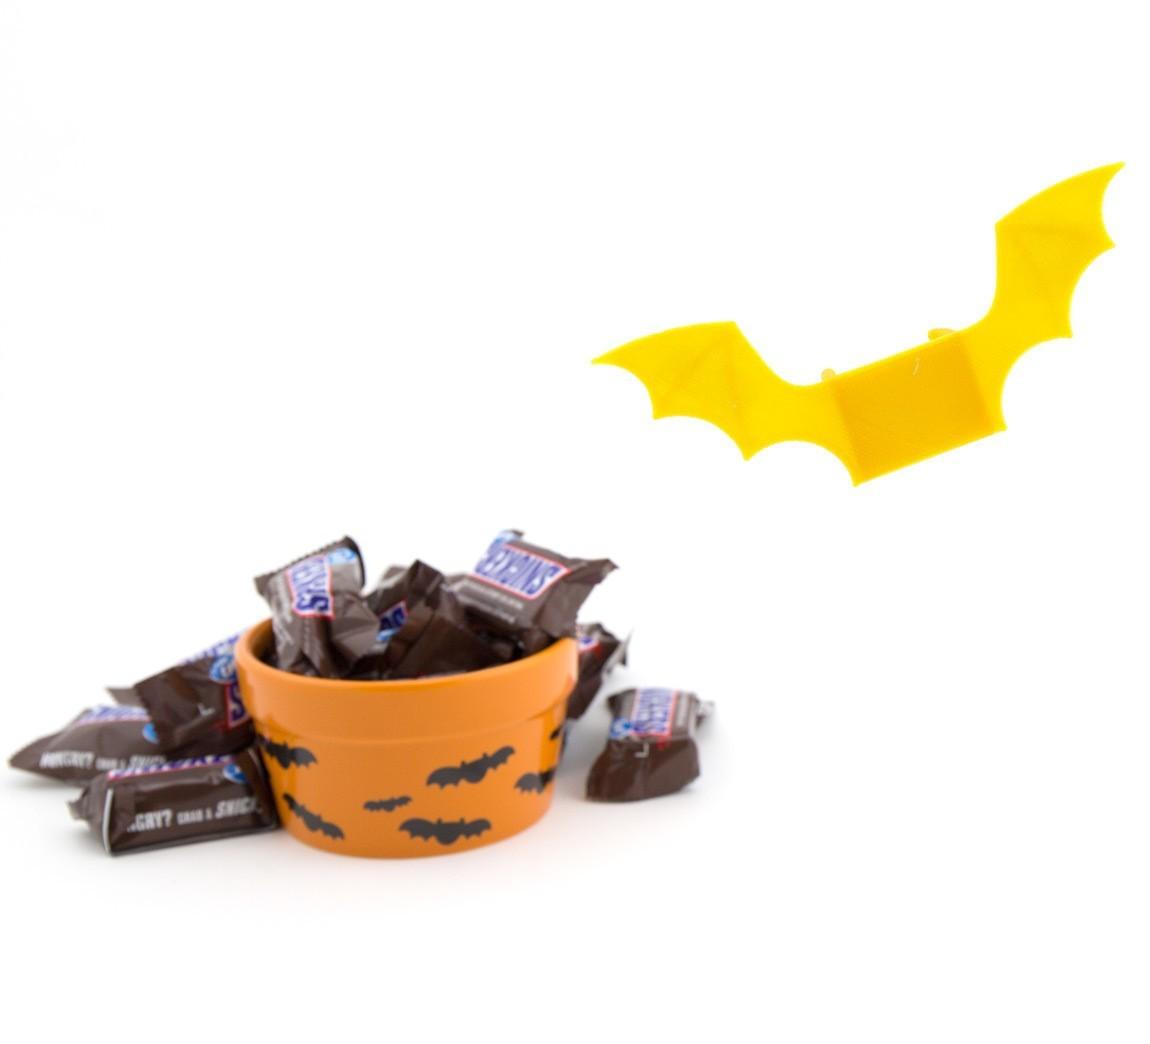 599e0620fc1185944a4f98c23bb33628_1445642710201_NMD000774a.jpg Download free STL file Fun Size Bat Wings • 3D printable model, Hom3d